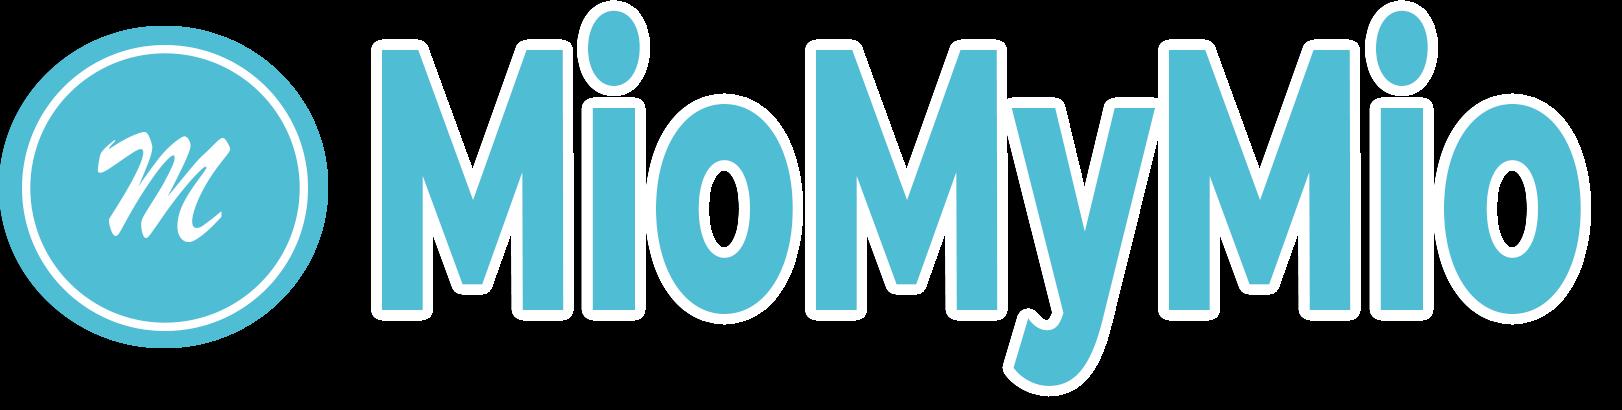 MioMyMio